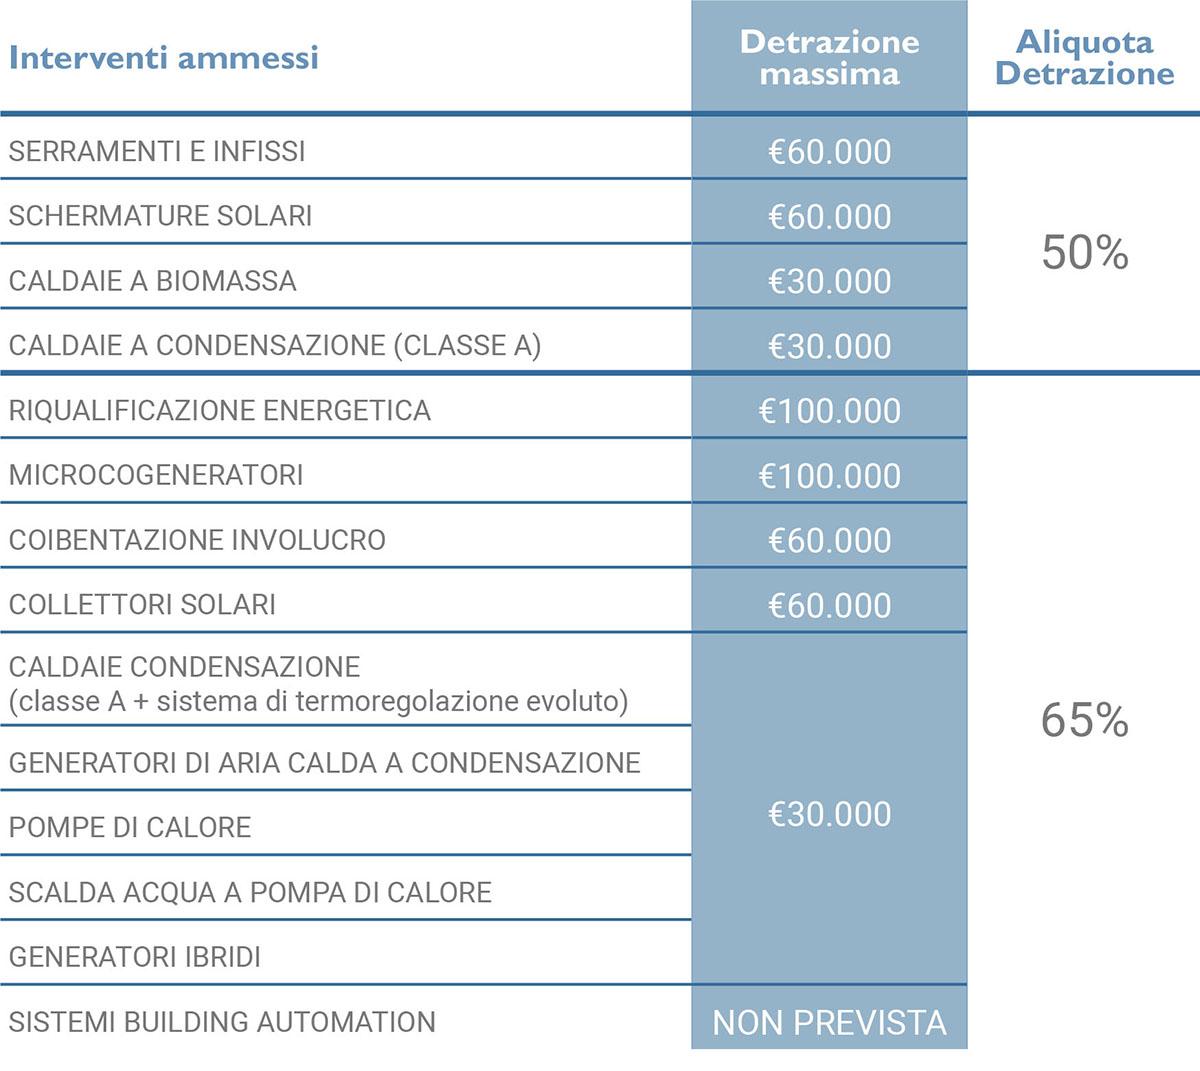 ecobonus interventi detrazioni